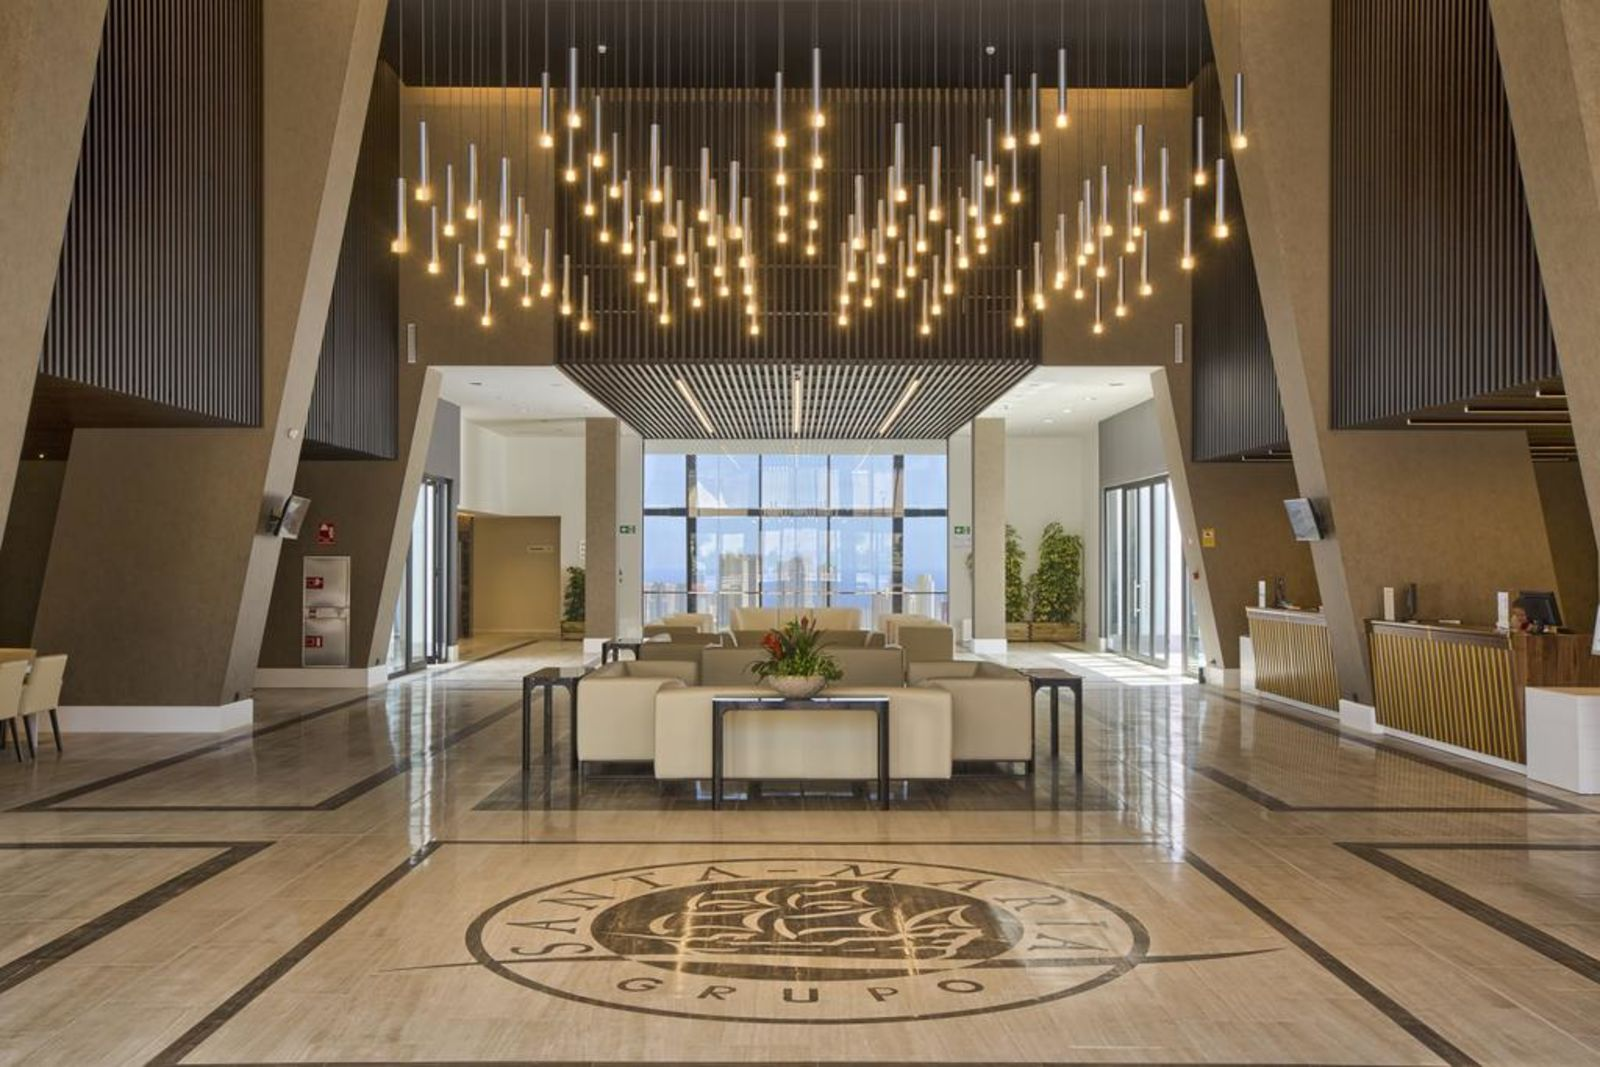 mediavault_images/Grand Luxor Hotel 4